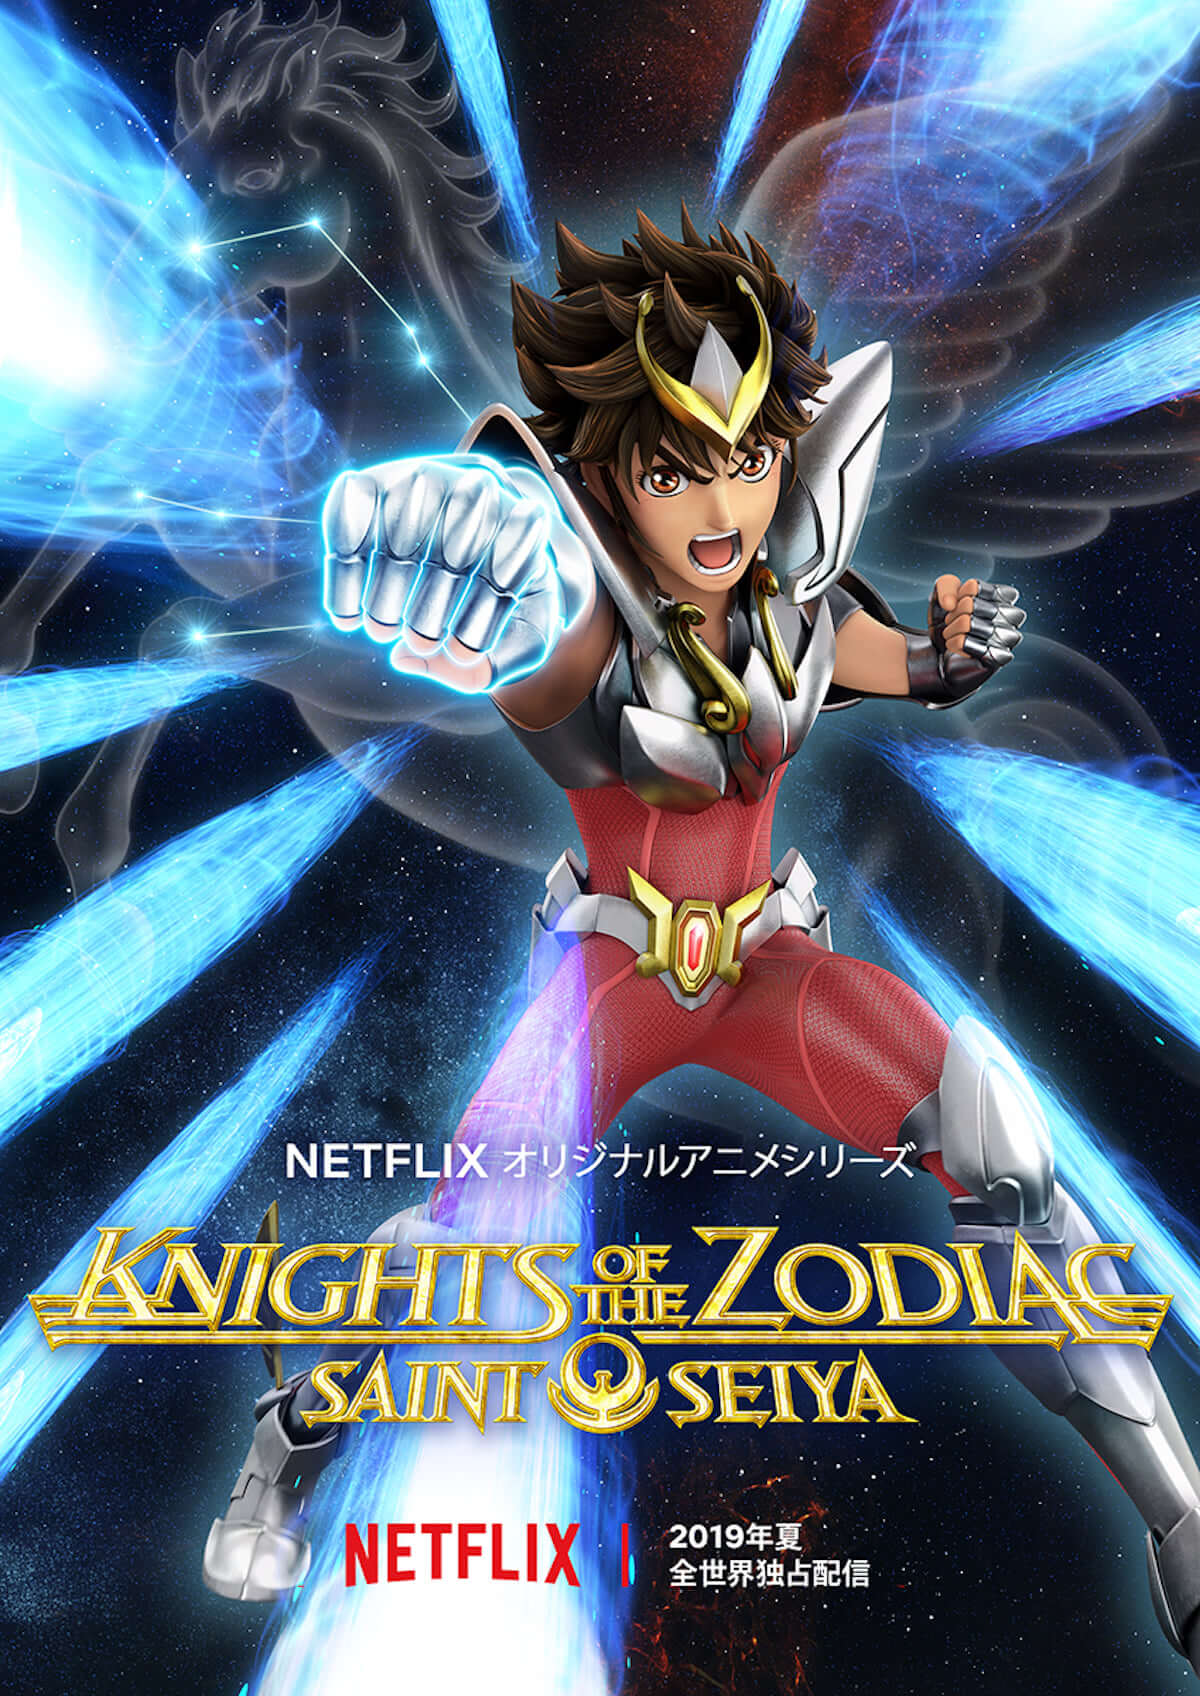 Netflixで新世紀エヴァンゲリオンが2019年春から全世界独占配信! film181127_netflix-anime_3-1200x1696